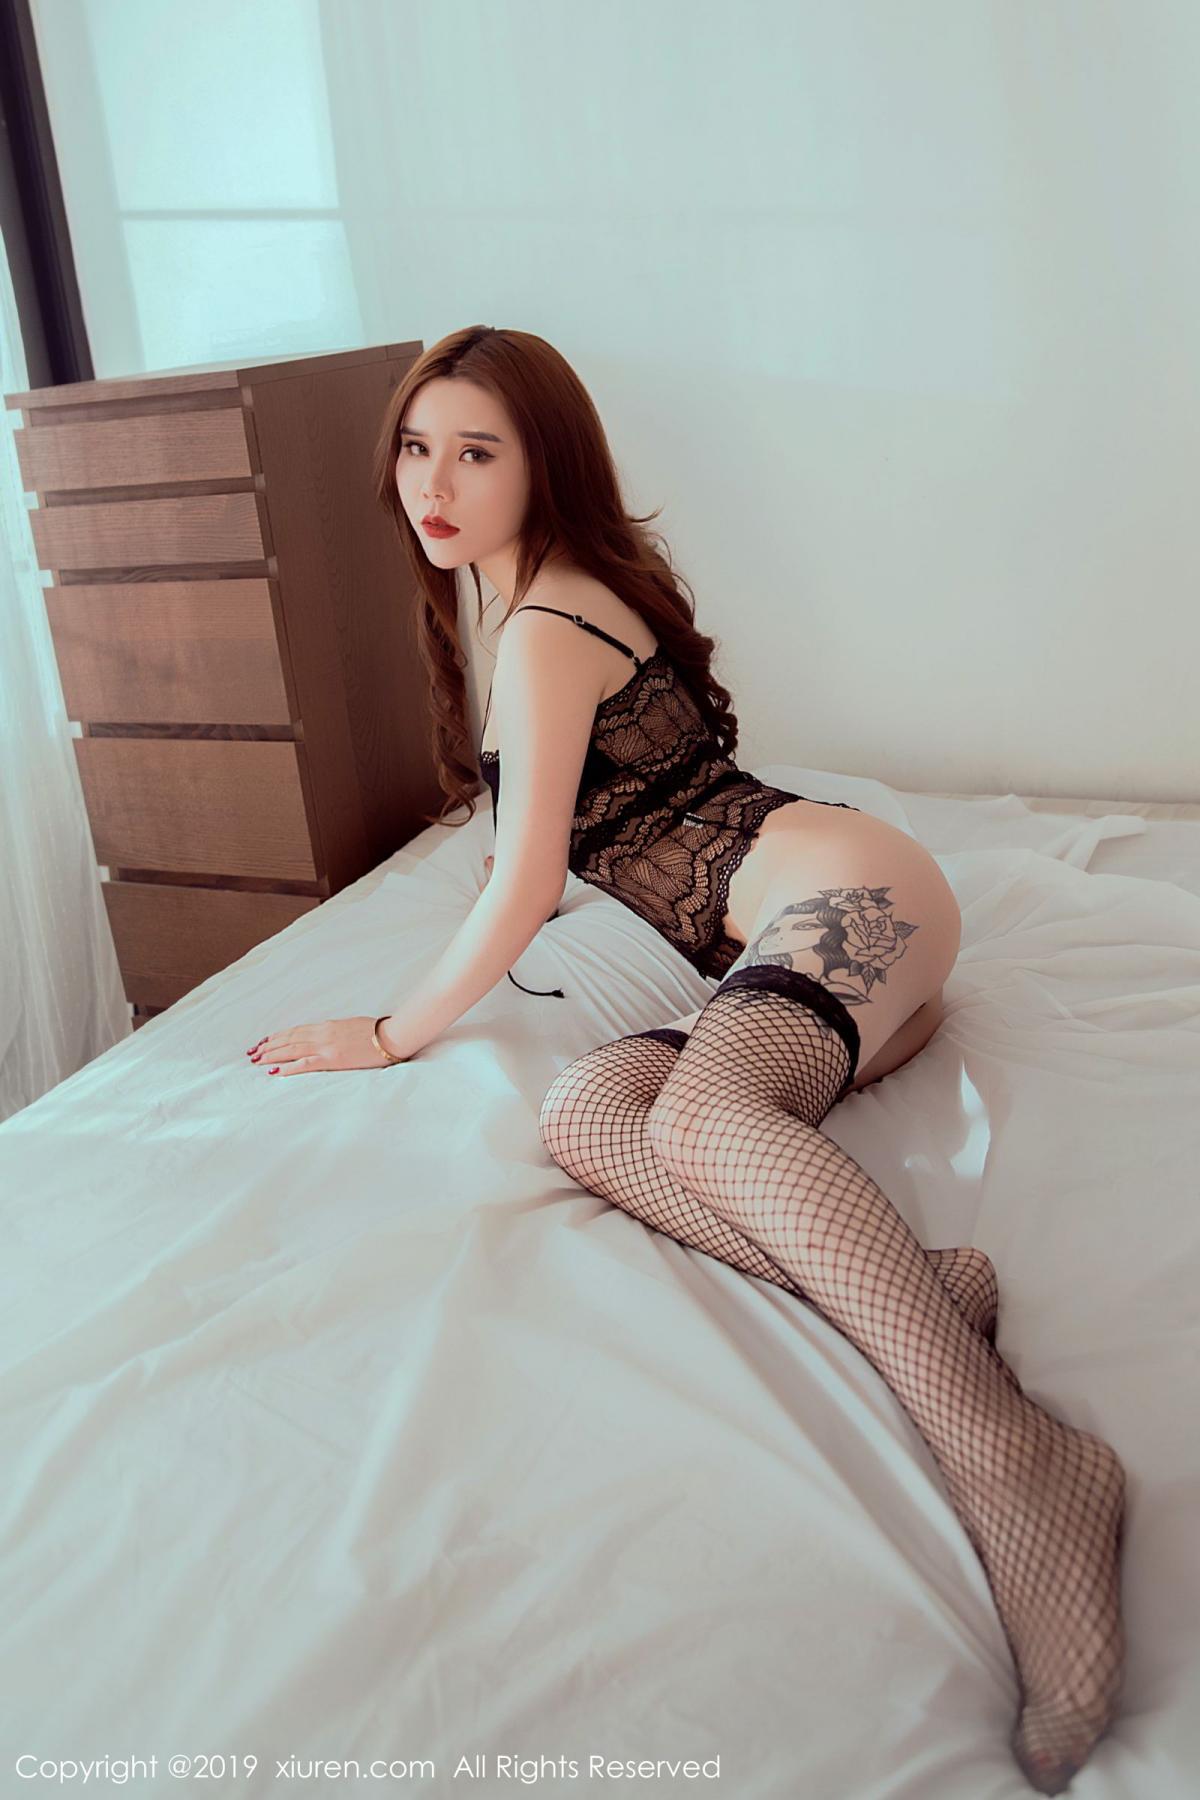 [XiuRen] Vol.1515 Ai Li Sha Lisa 45P, Ai Li Sha Lisa, Big Booty, Underwear, Xiuren